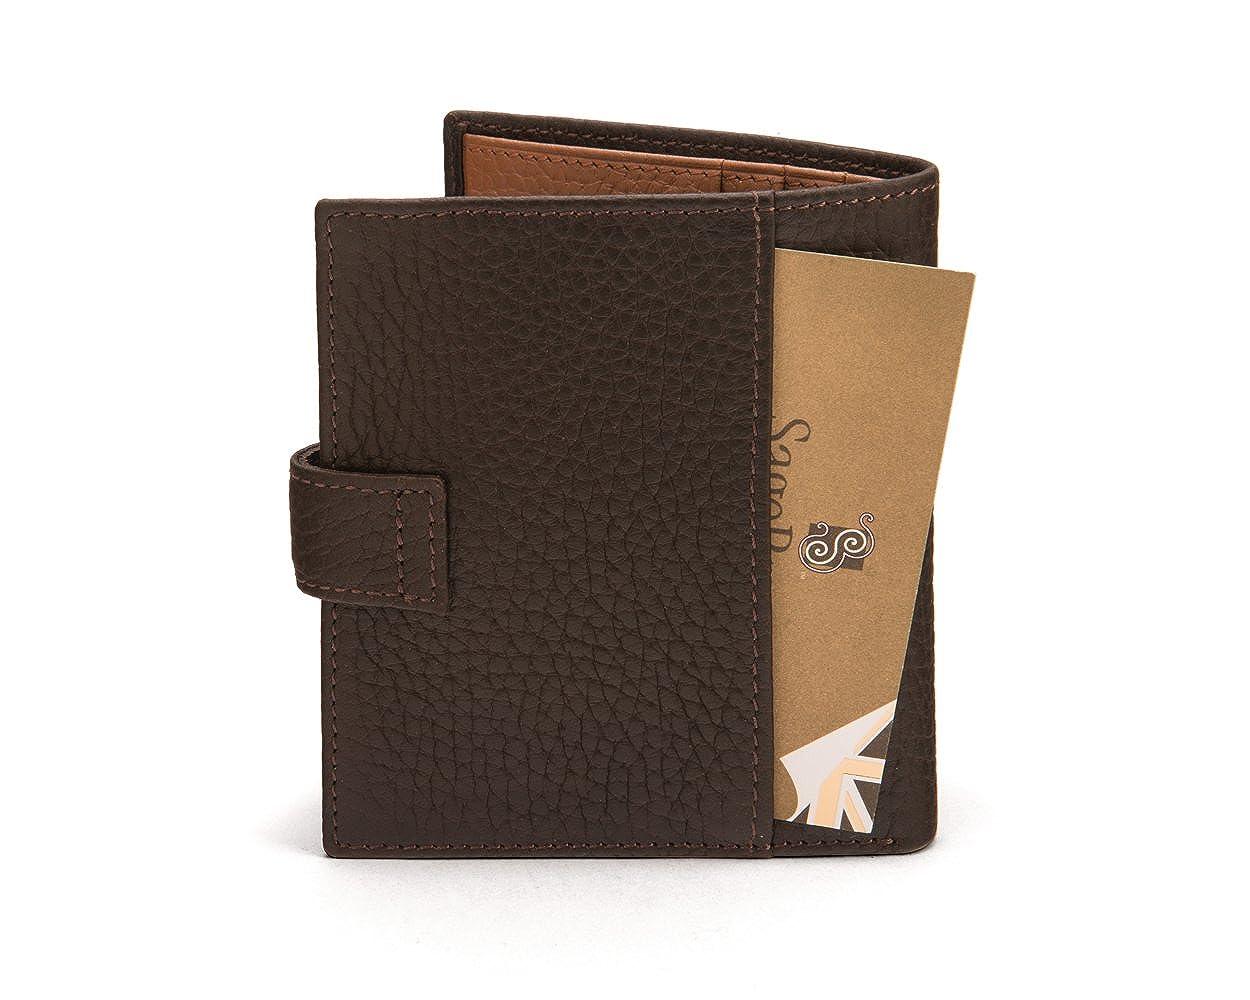 Sagebraun Compact Billfold Billfold Billfold Wallet With Tab B073S8J8VH Geldbrsen 30d5ce